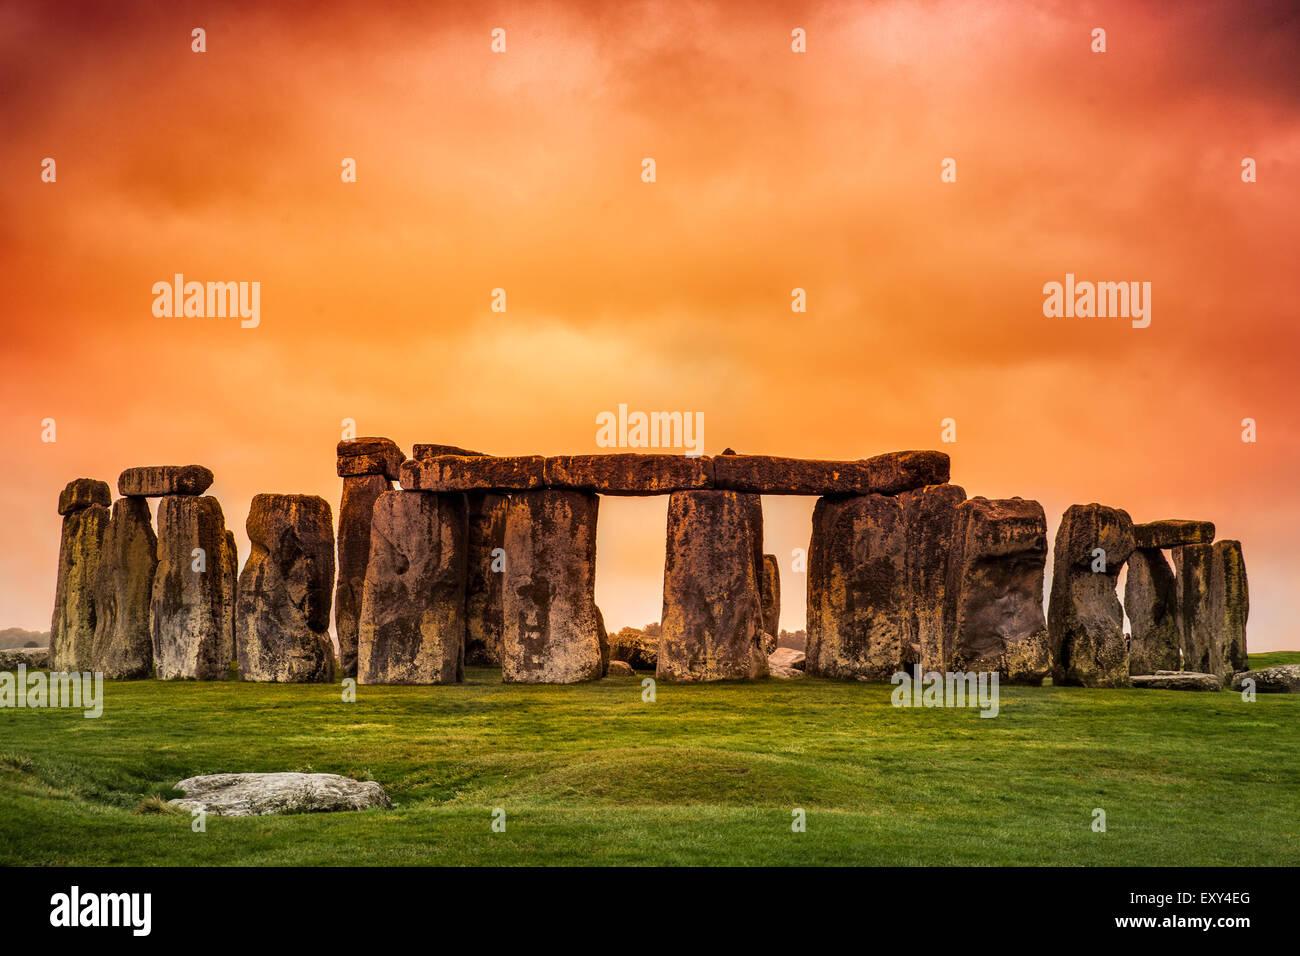 Stonehenge contre fiery orange sunset sky Photo Stock